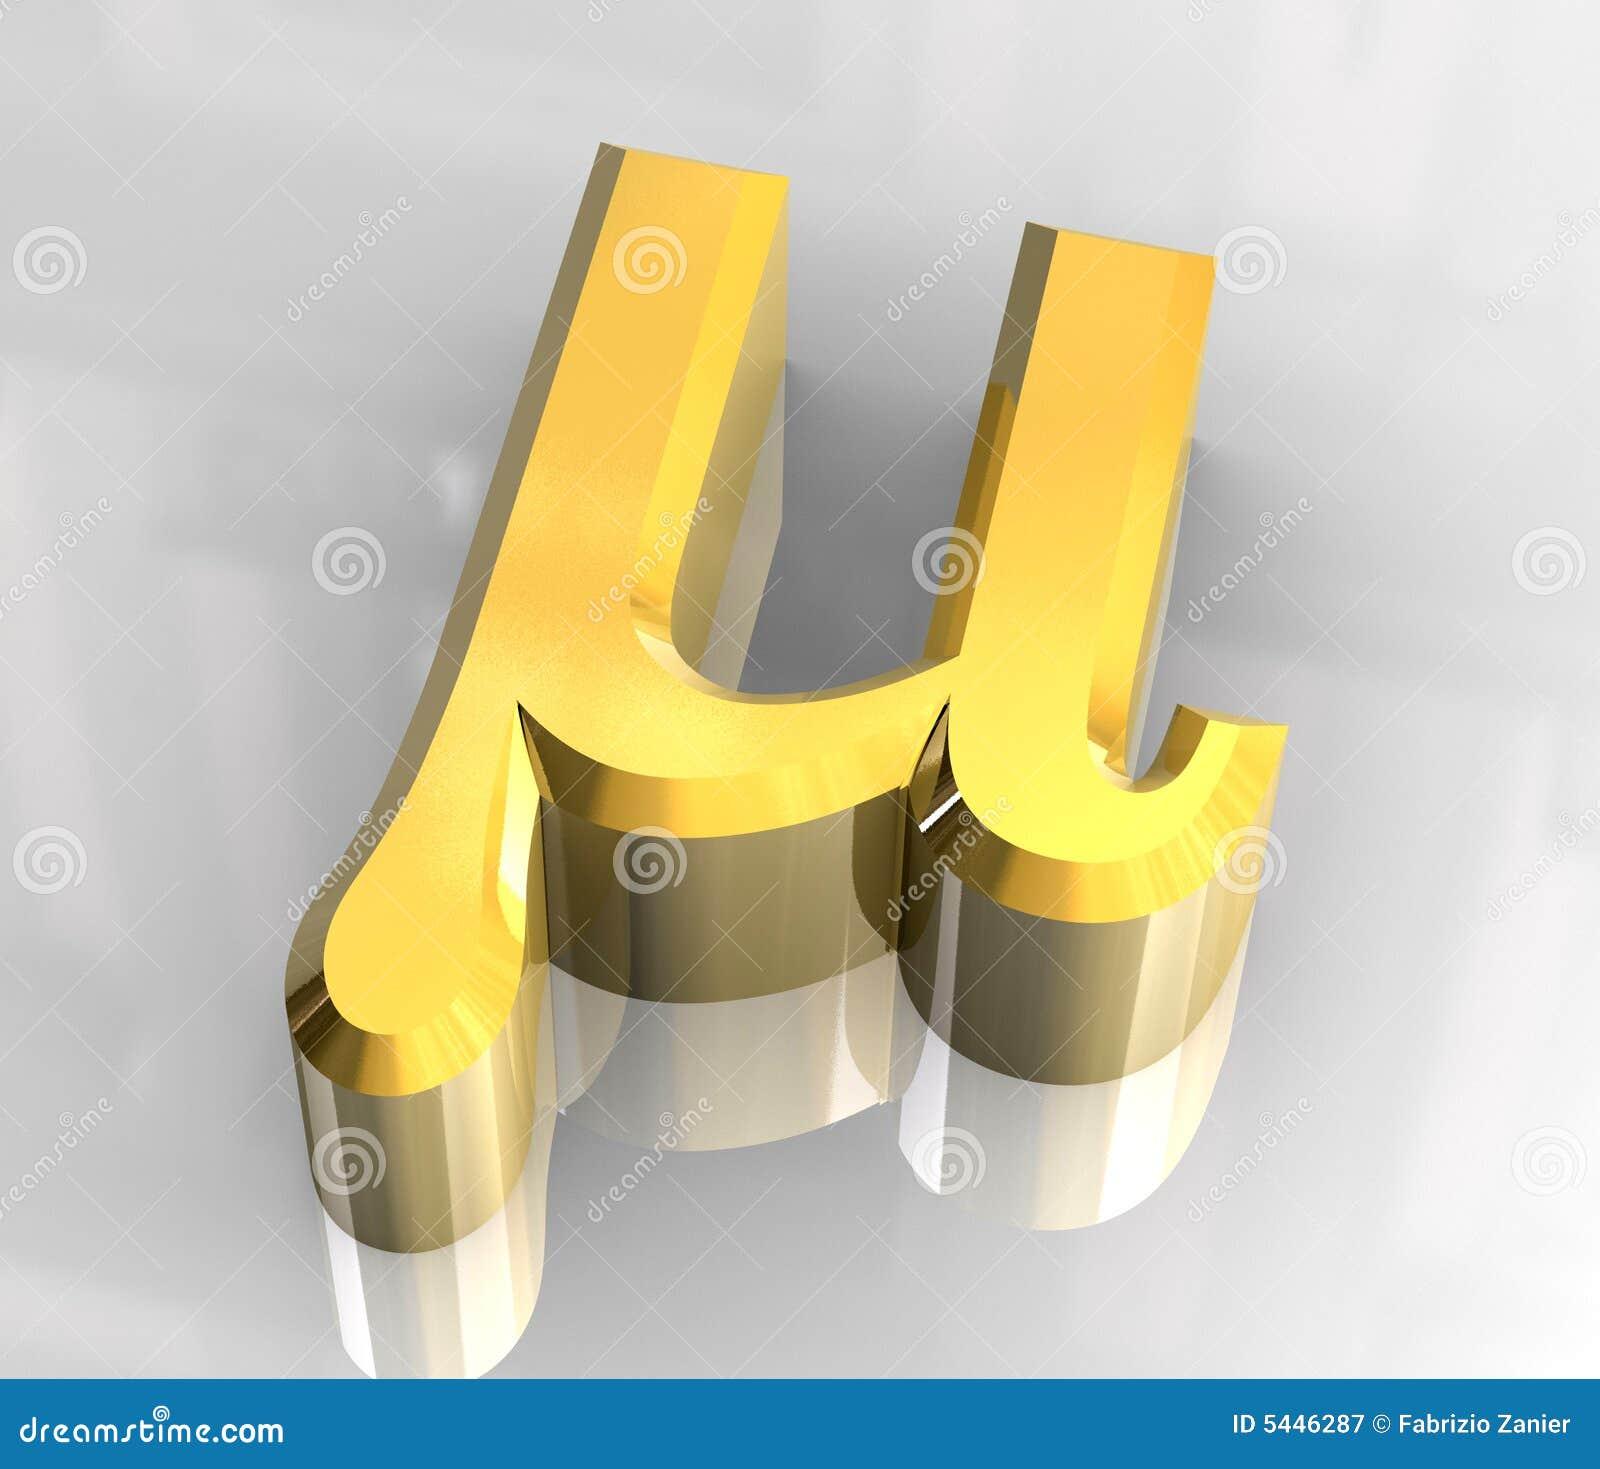 Sigma symbol in gold 3d stock illustration illustration of mu symbol in gold 3d royalty free stock photography buycottarizona